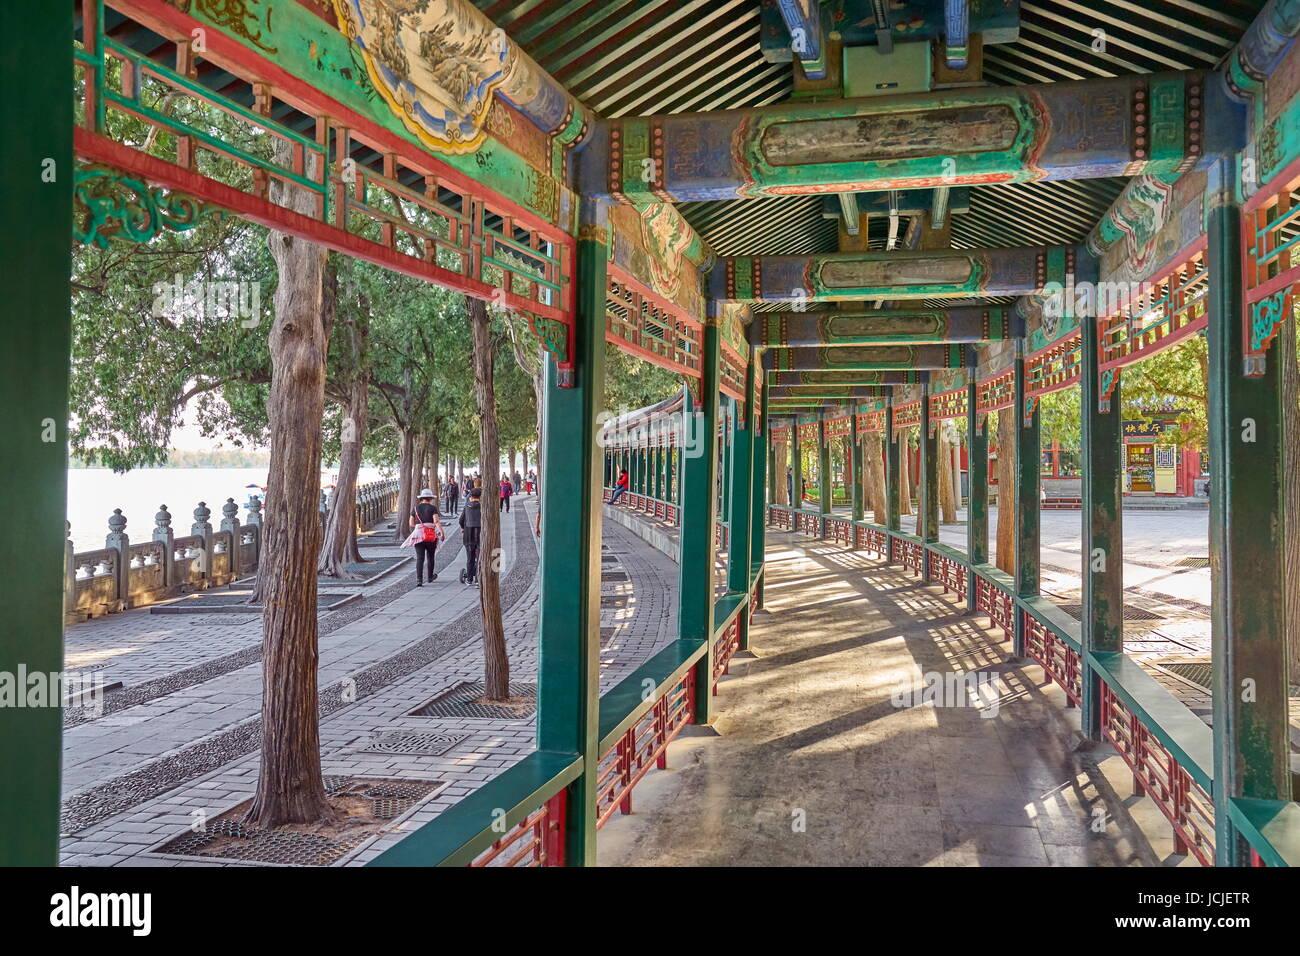 The Long Corridor, Summer Palace, Beijing, China - Stock Image